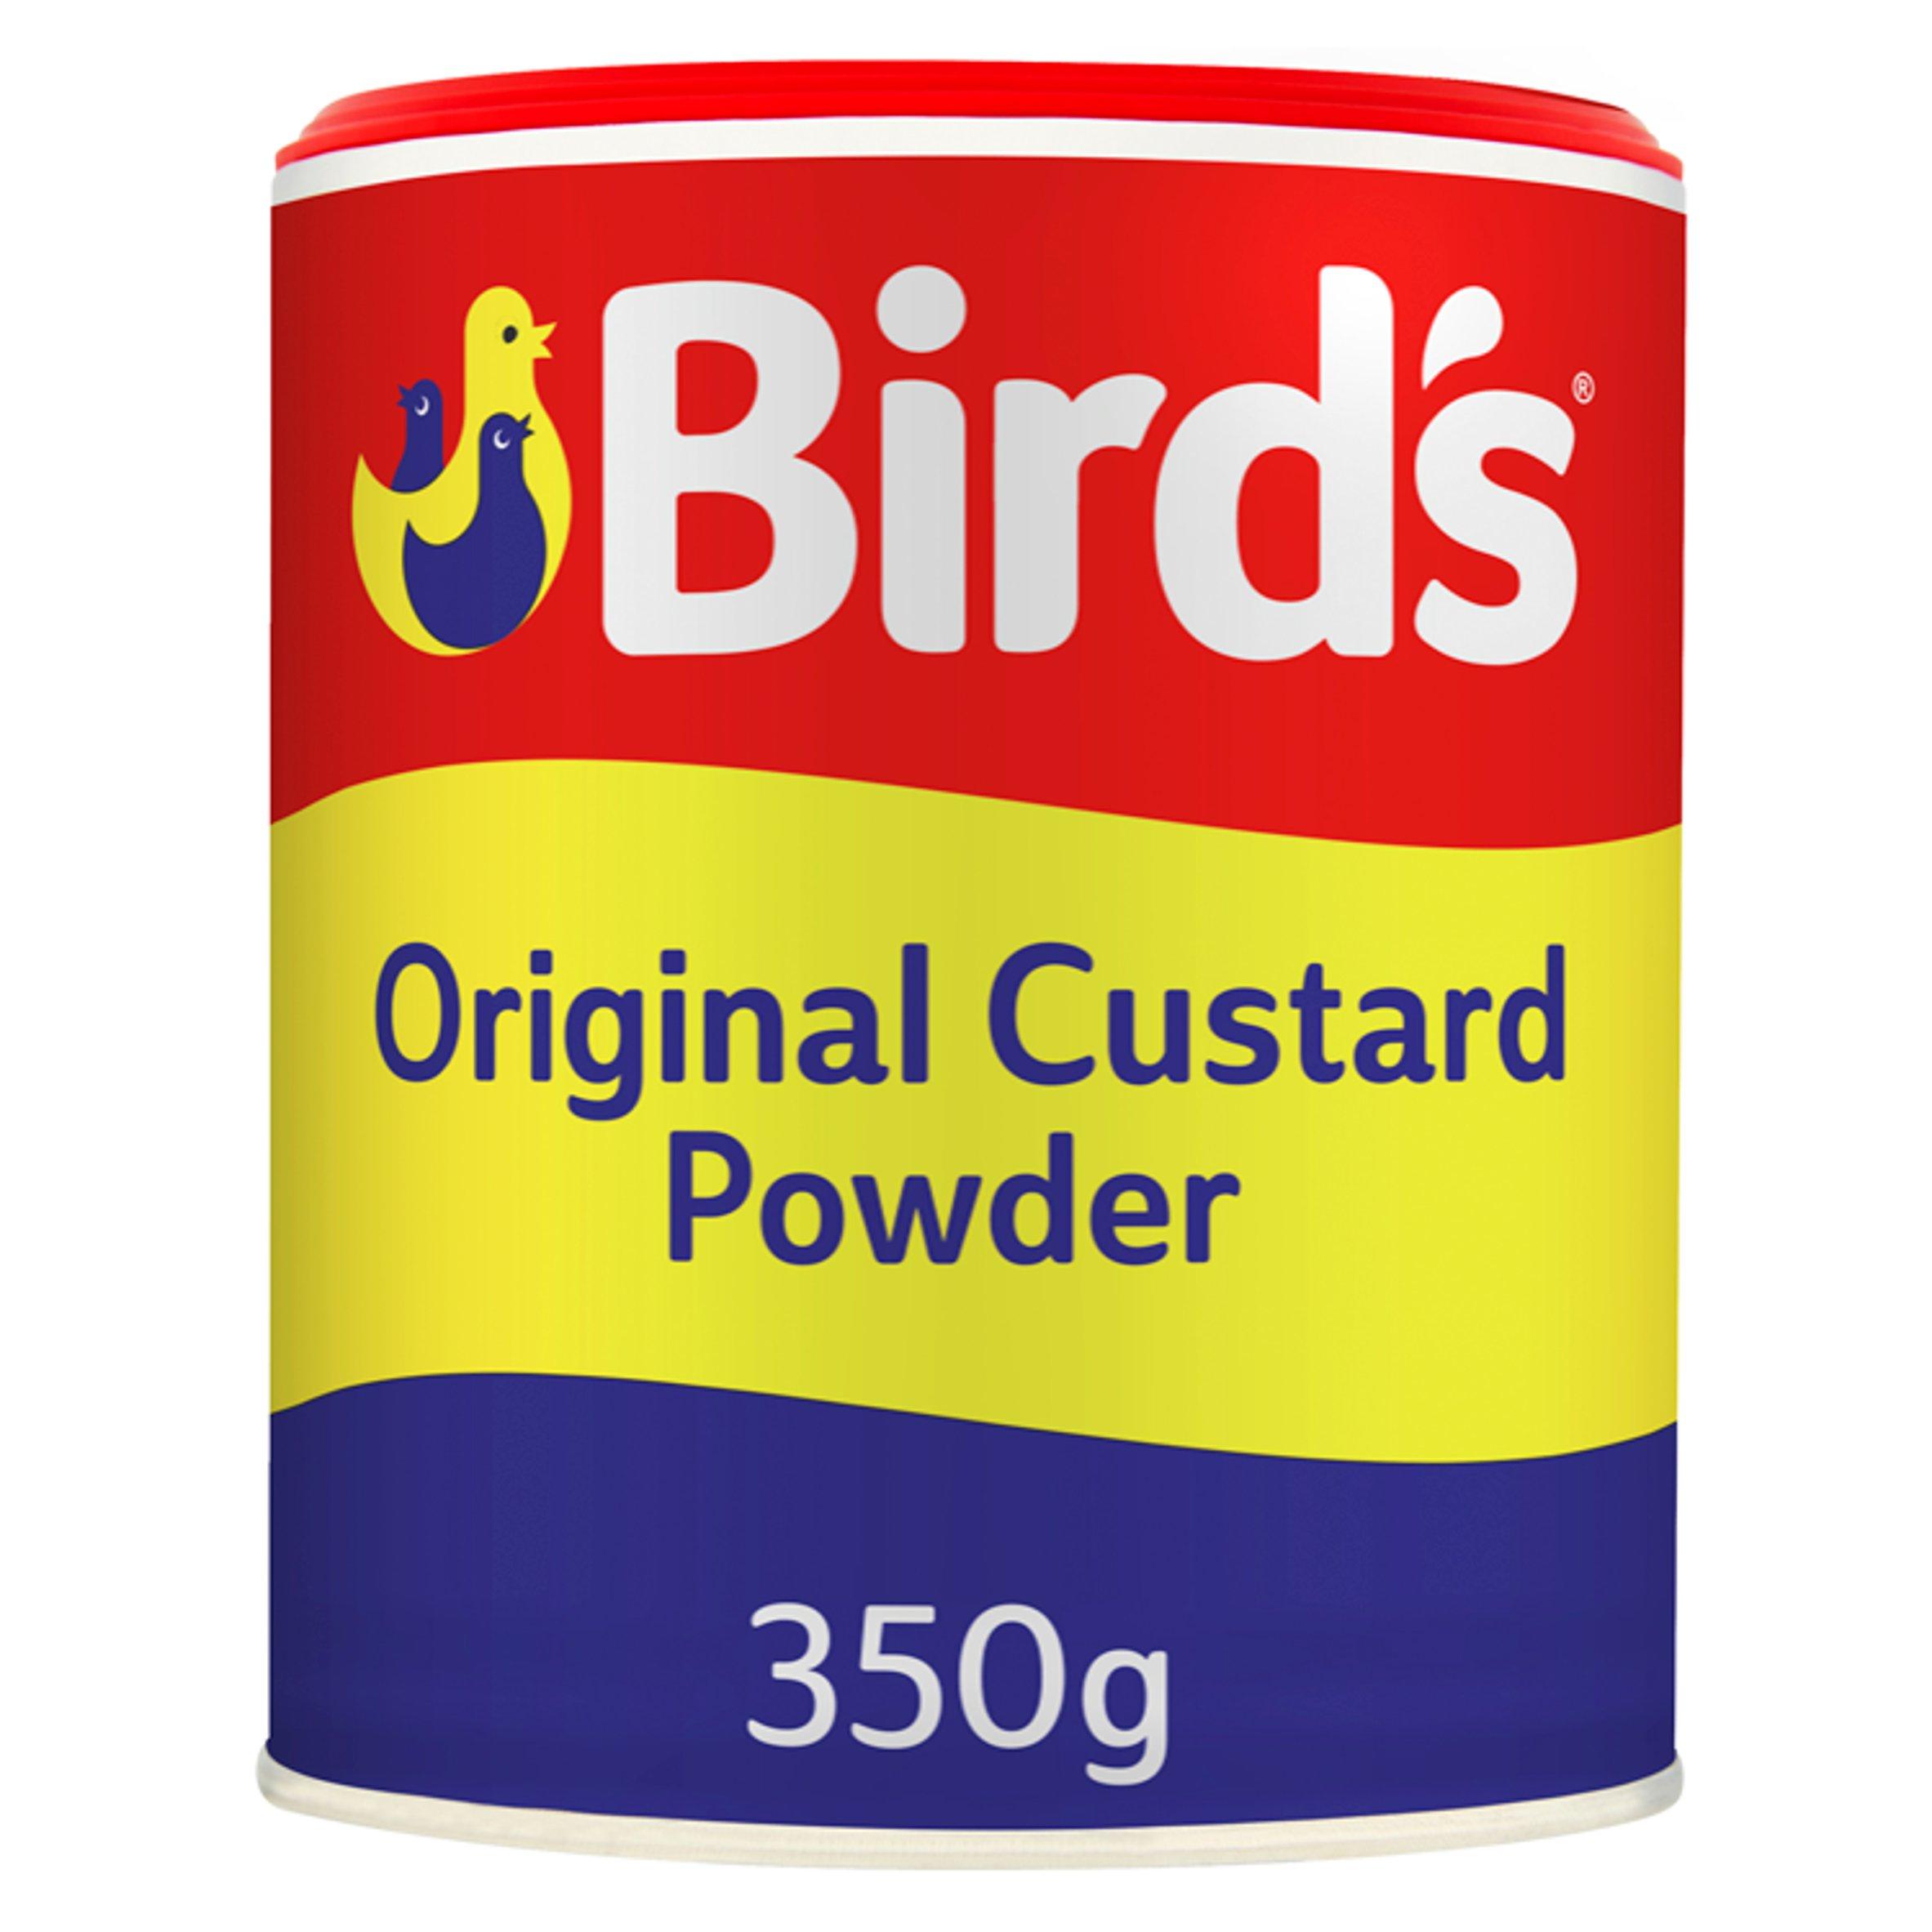 Birds Traditional Custard Powder 350G - Tesco Groceries